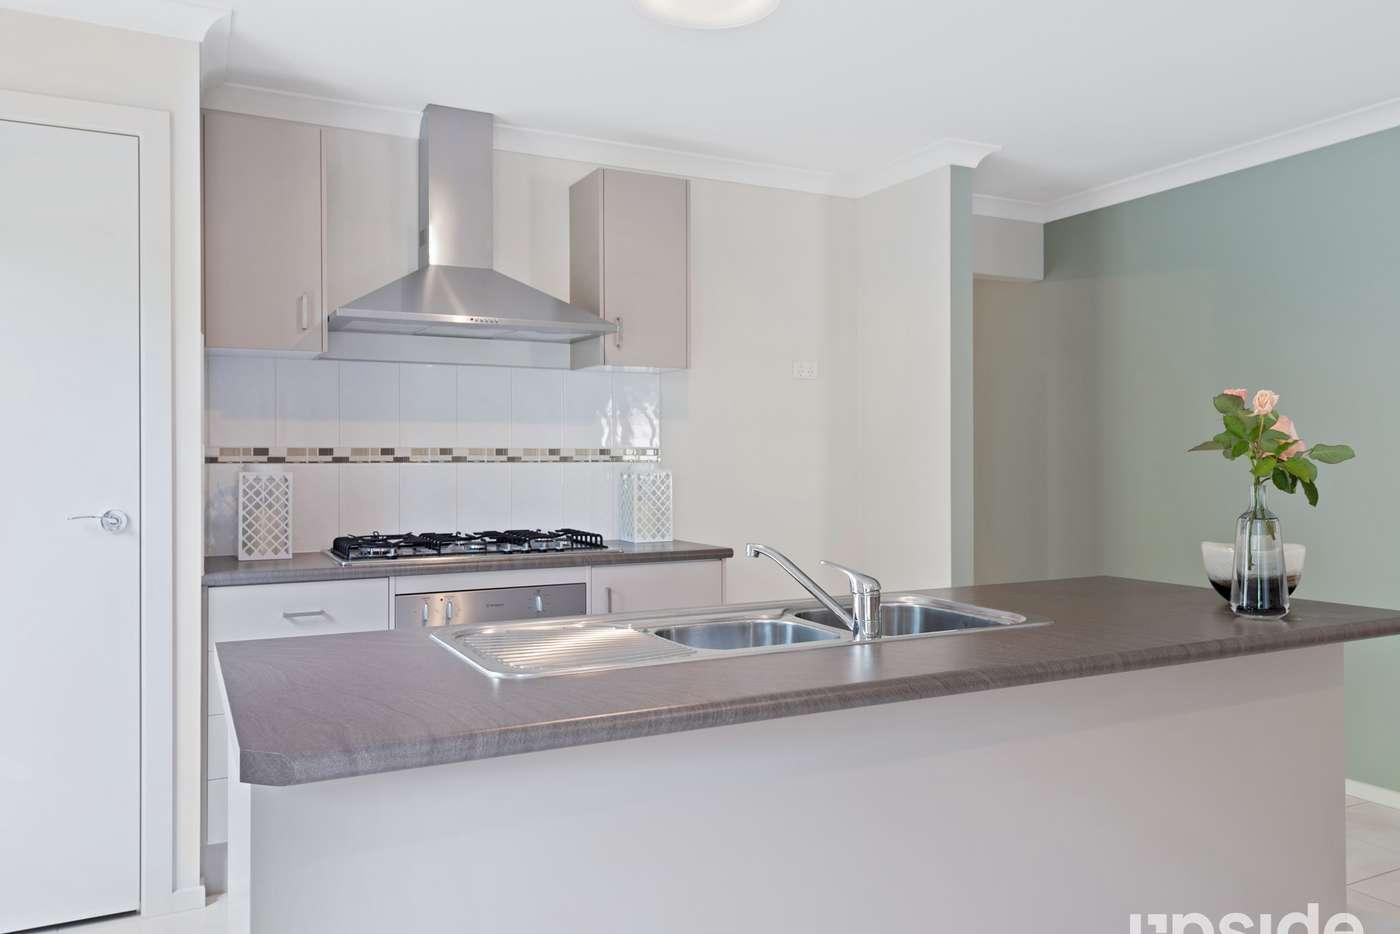 Sixth view of Homely house listing, 10 Nepeta Way, Pakenham VIC 3810